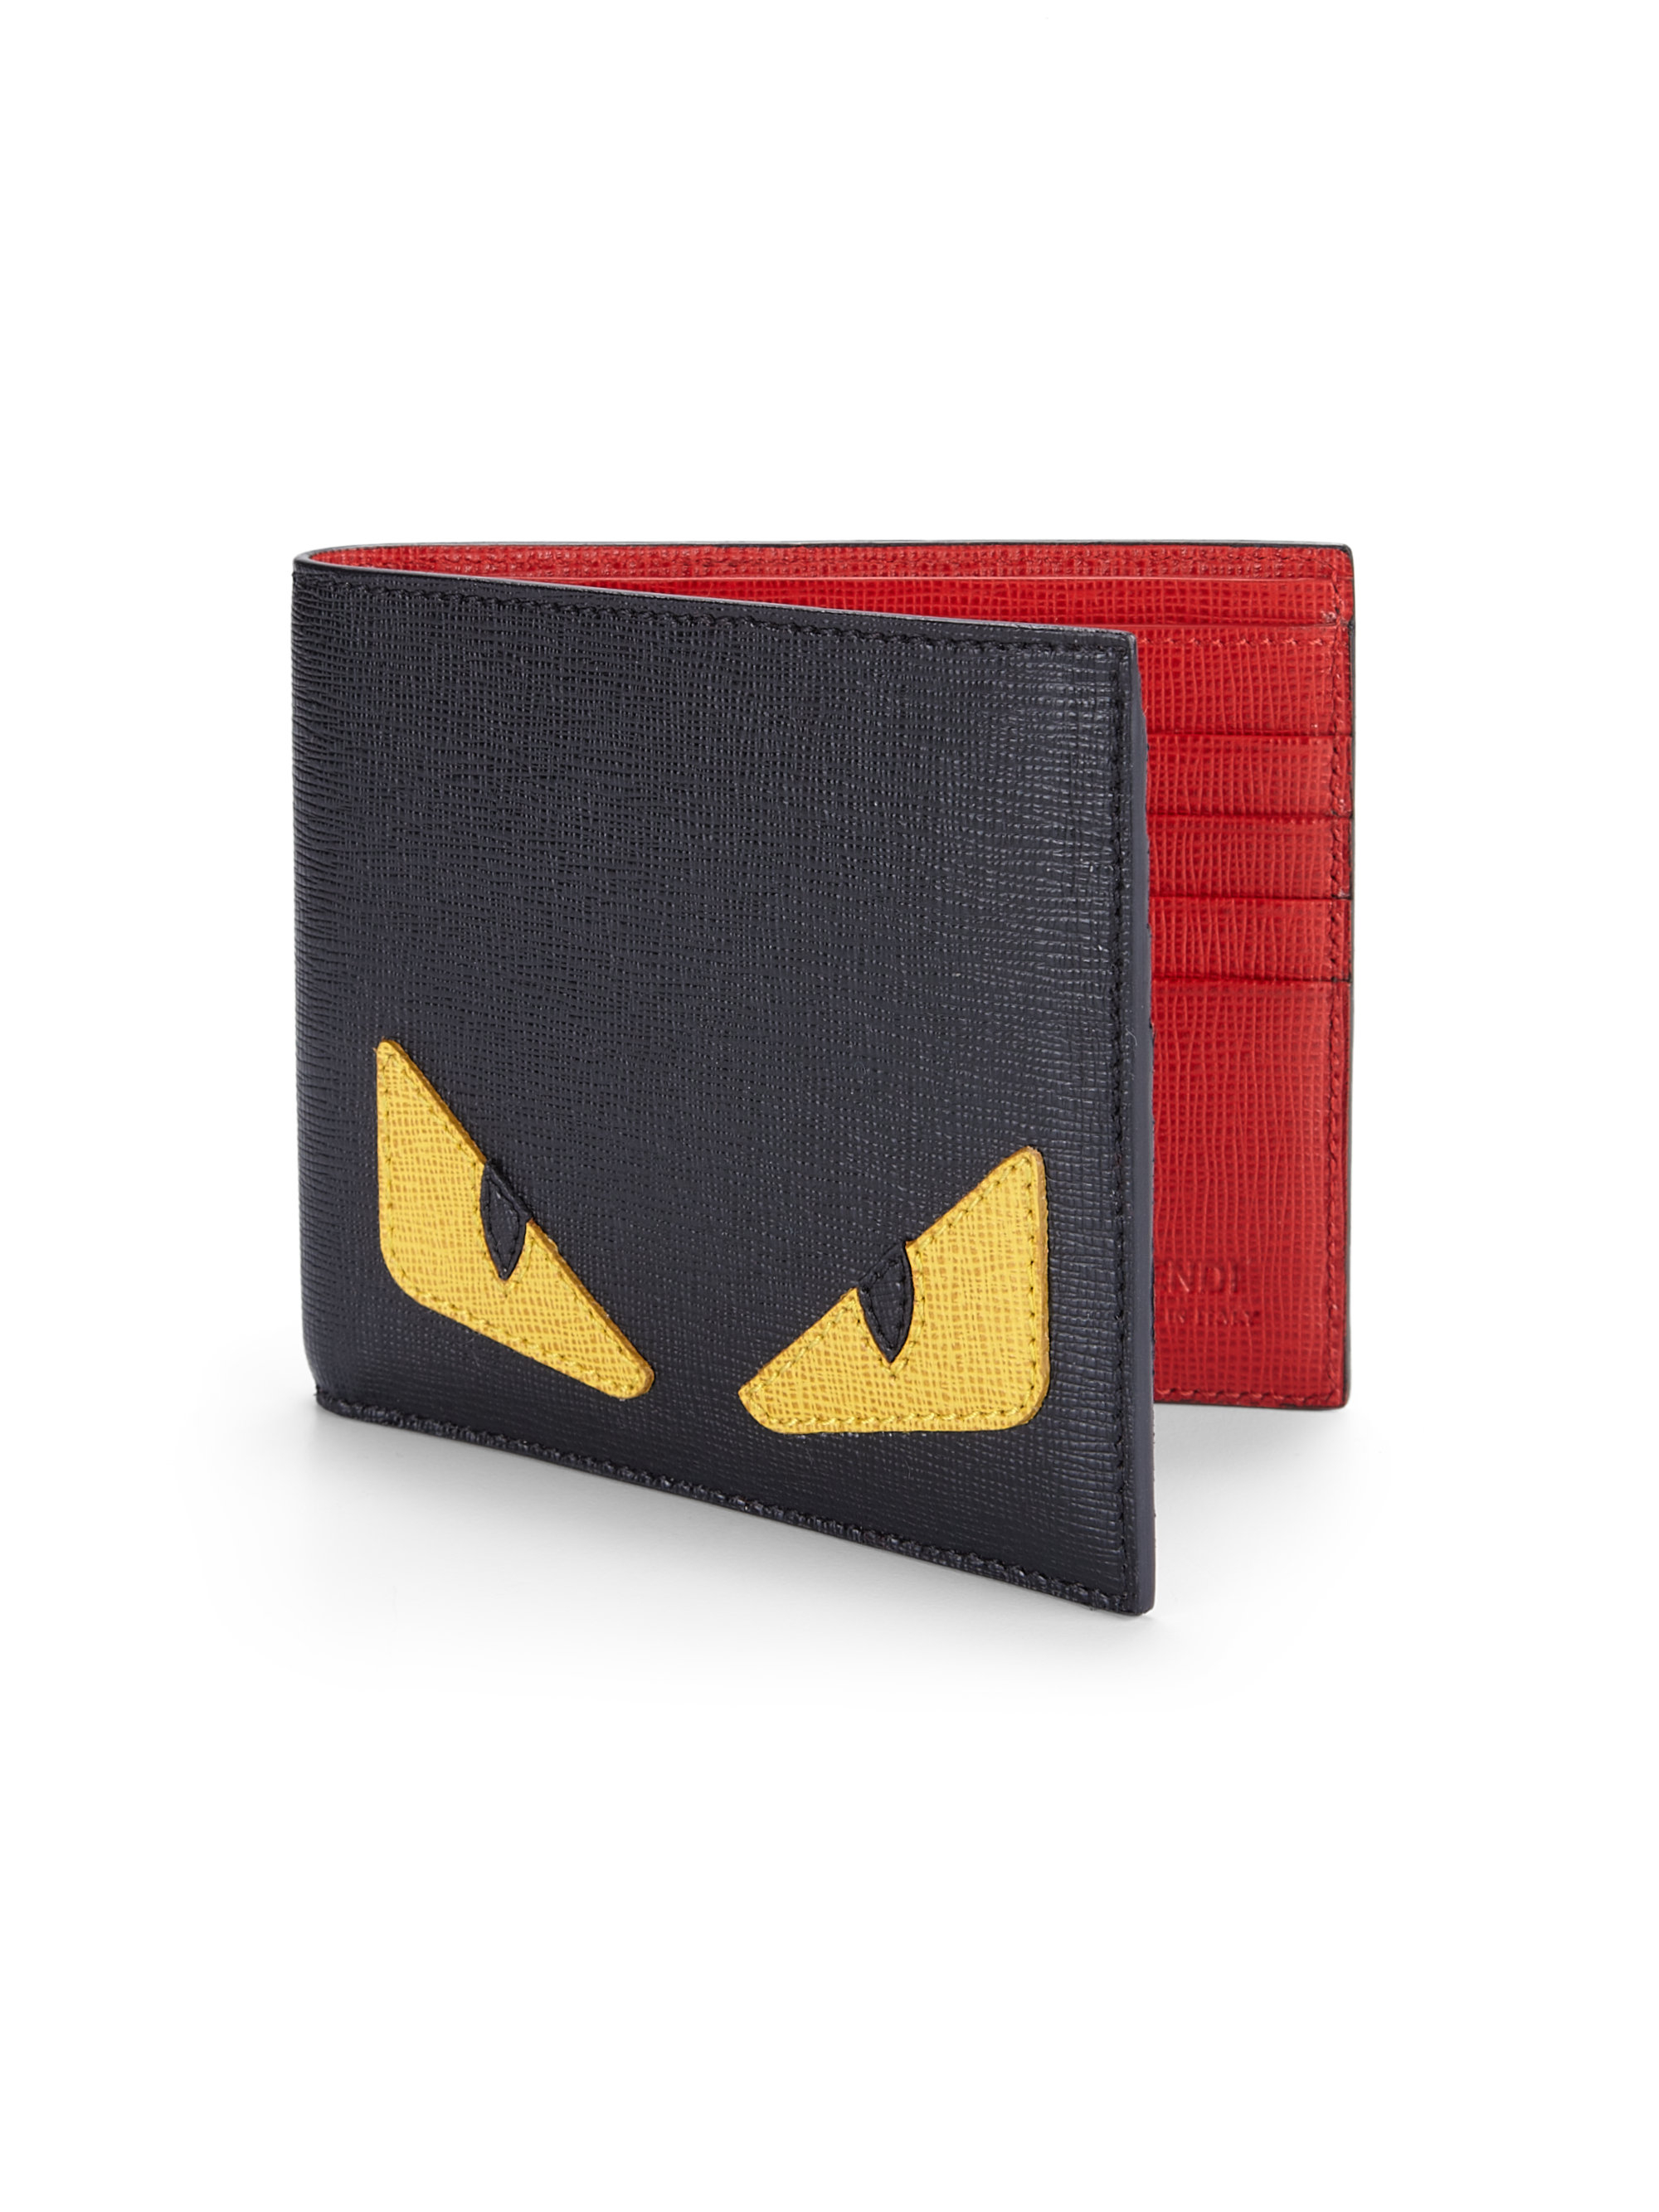 Fendi Wallet Black